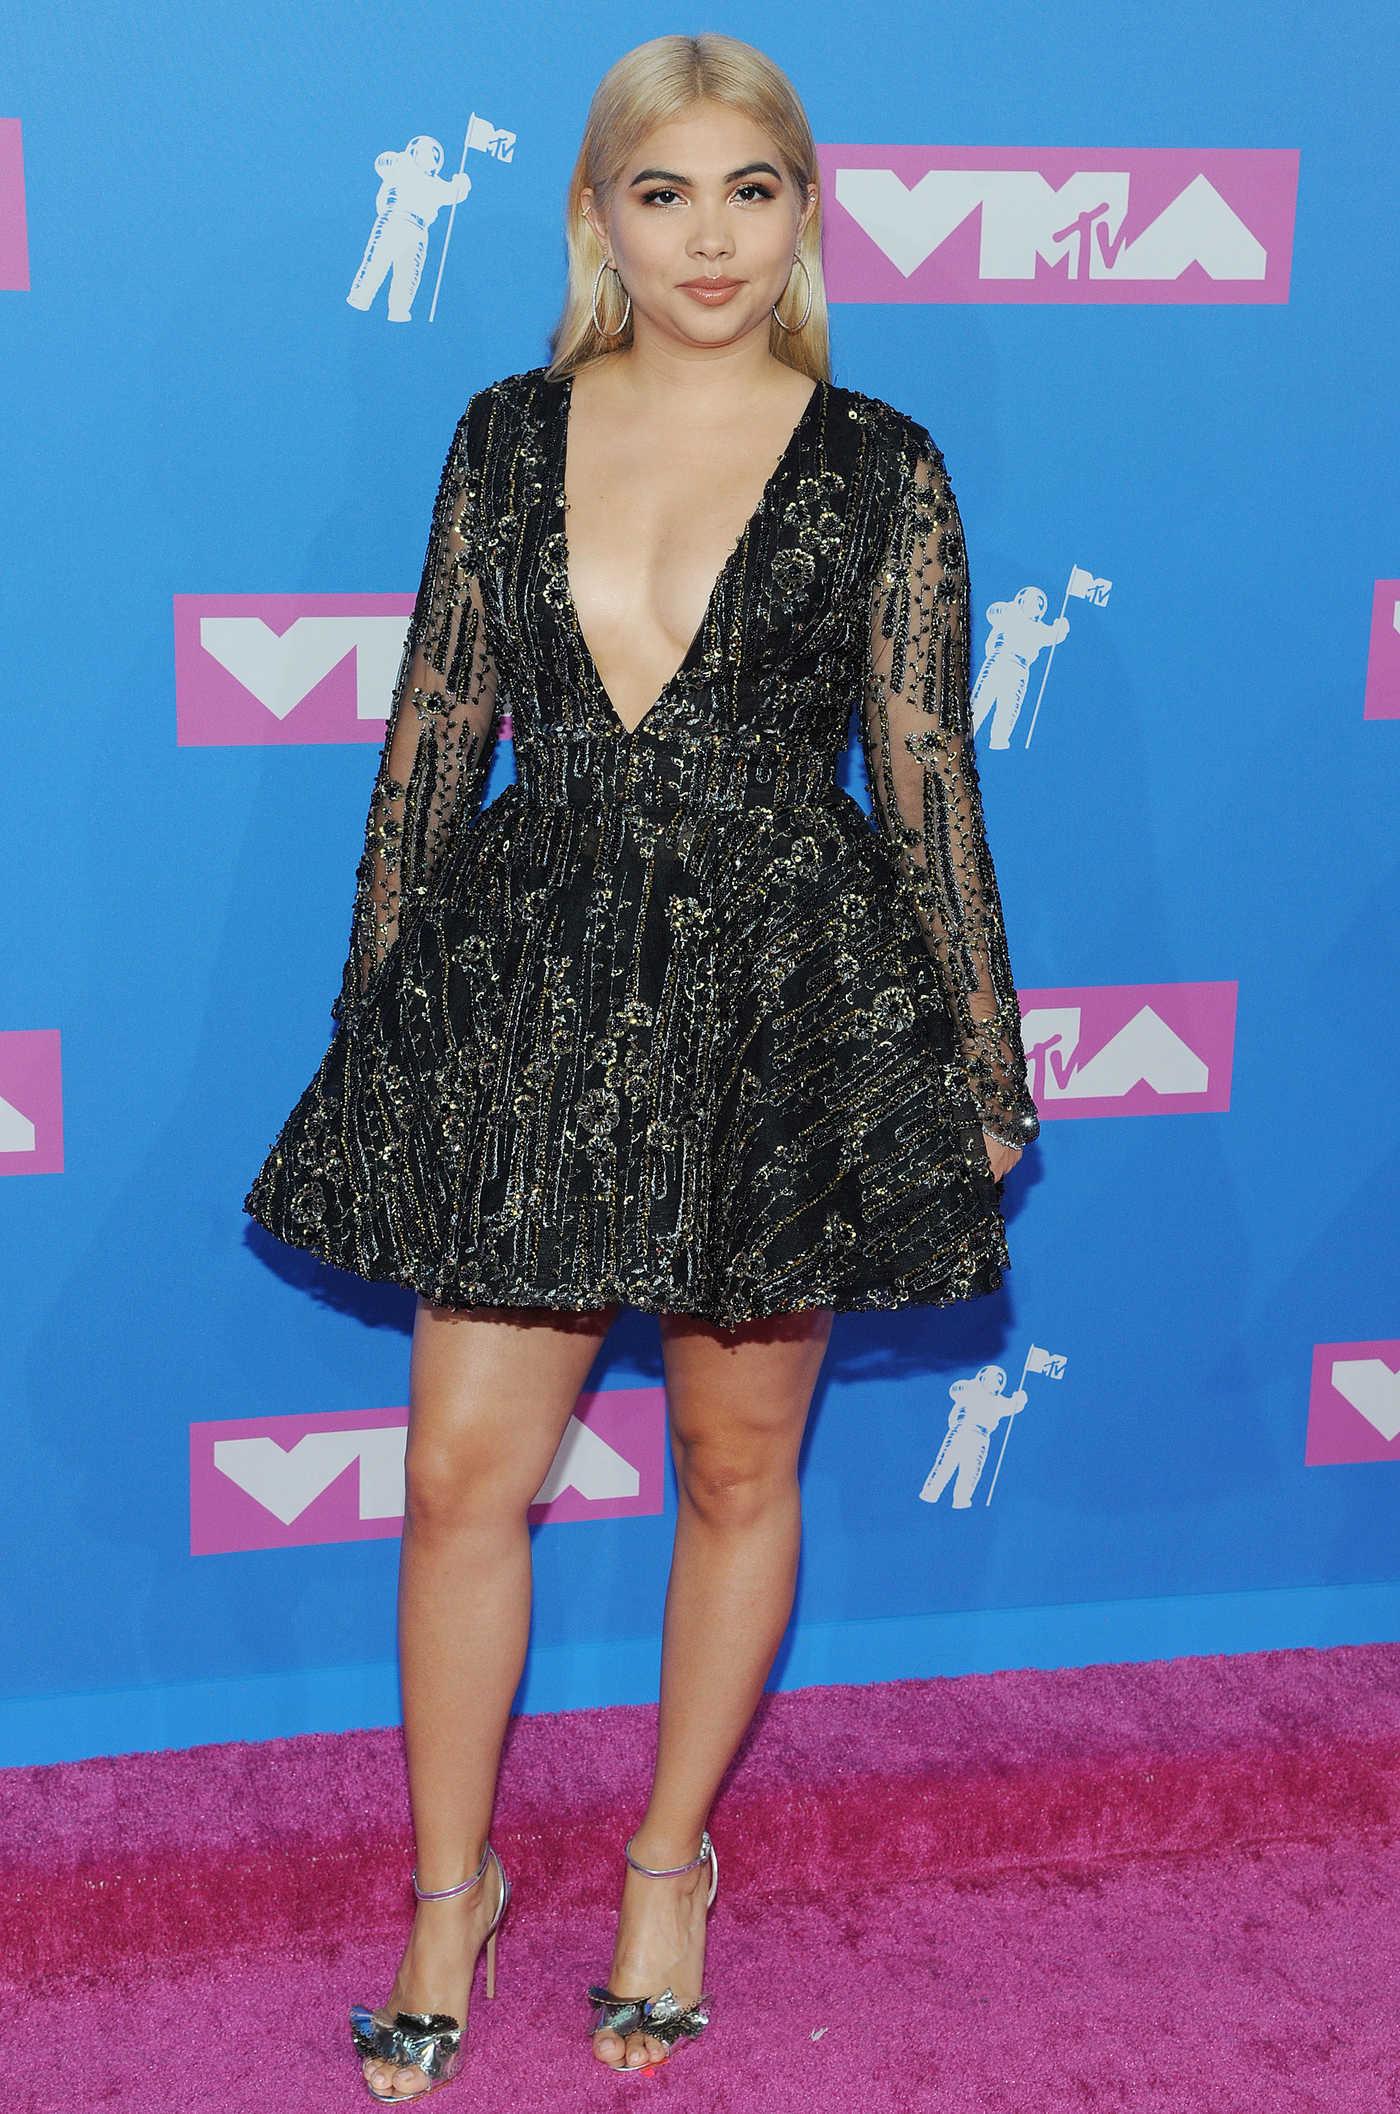 Hayley Kiyoko Attends 2018 MTV Video Music Awards in New York 08/20/2018